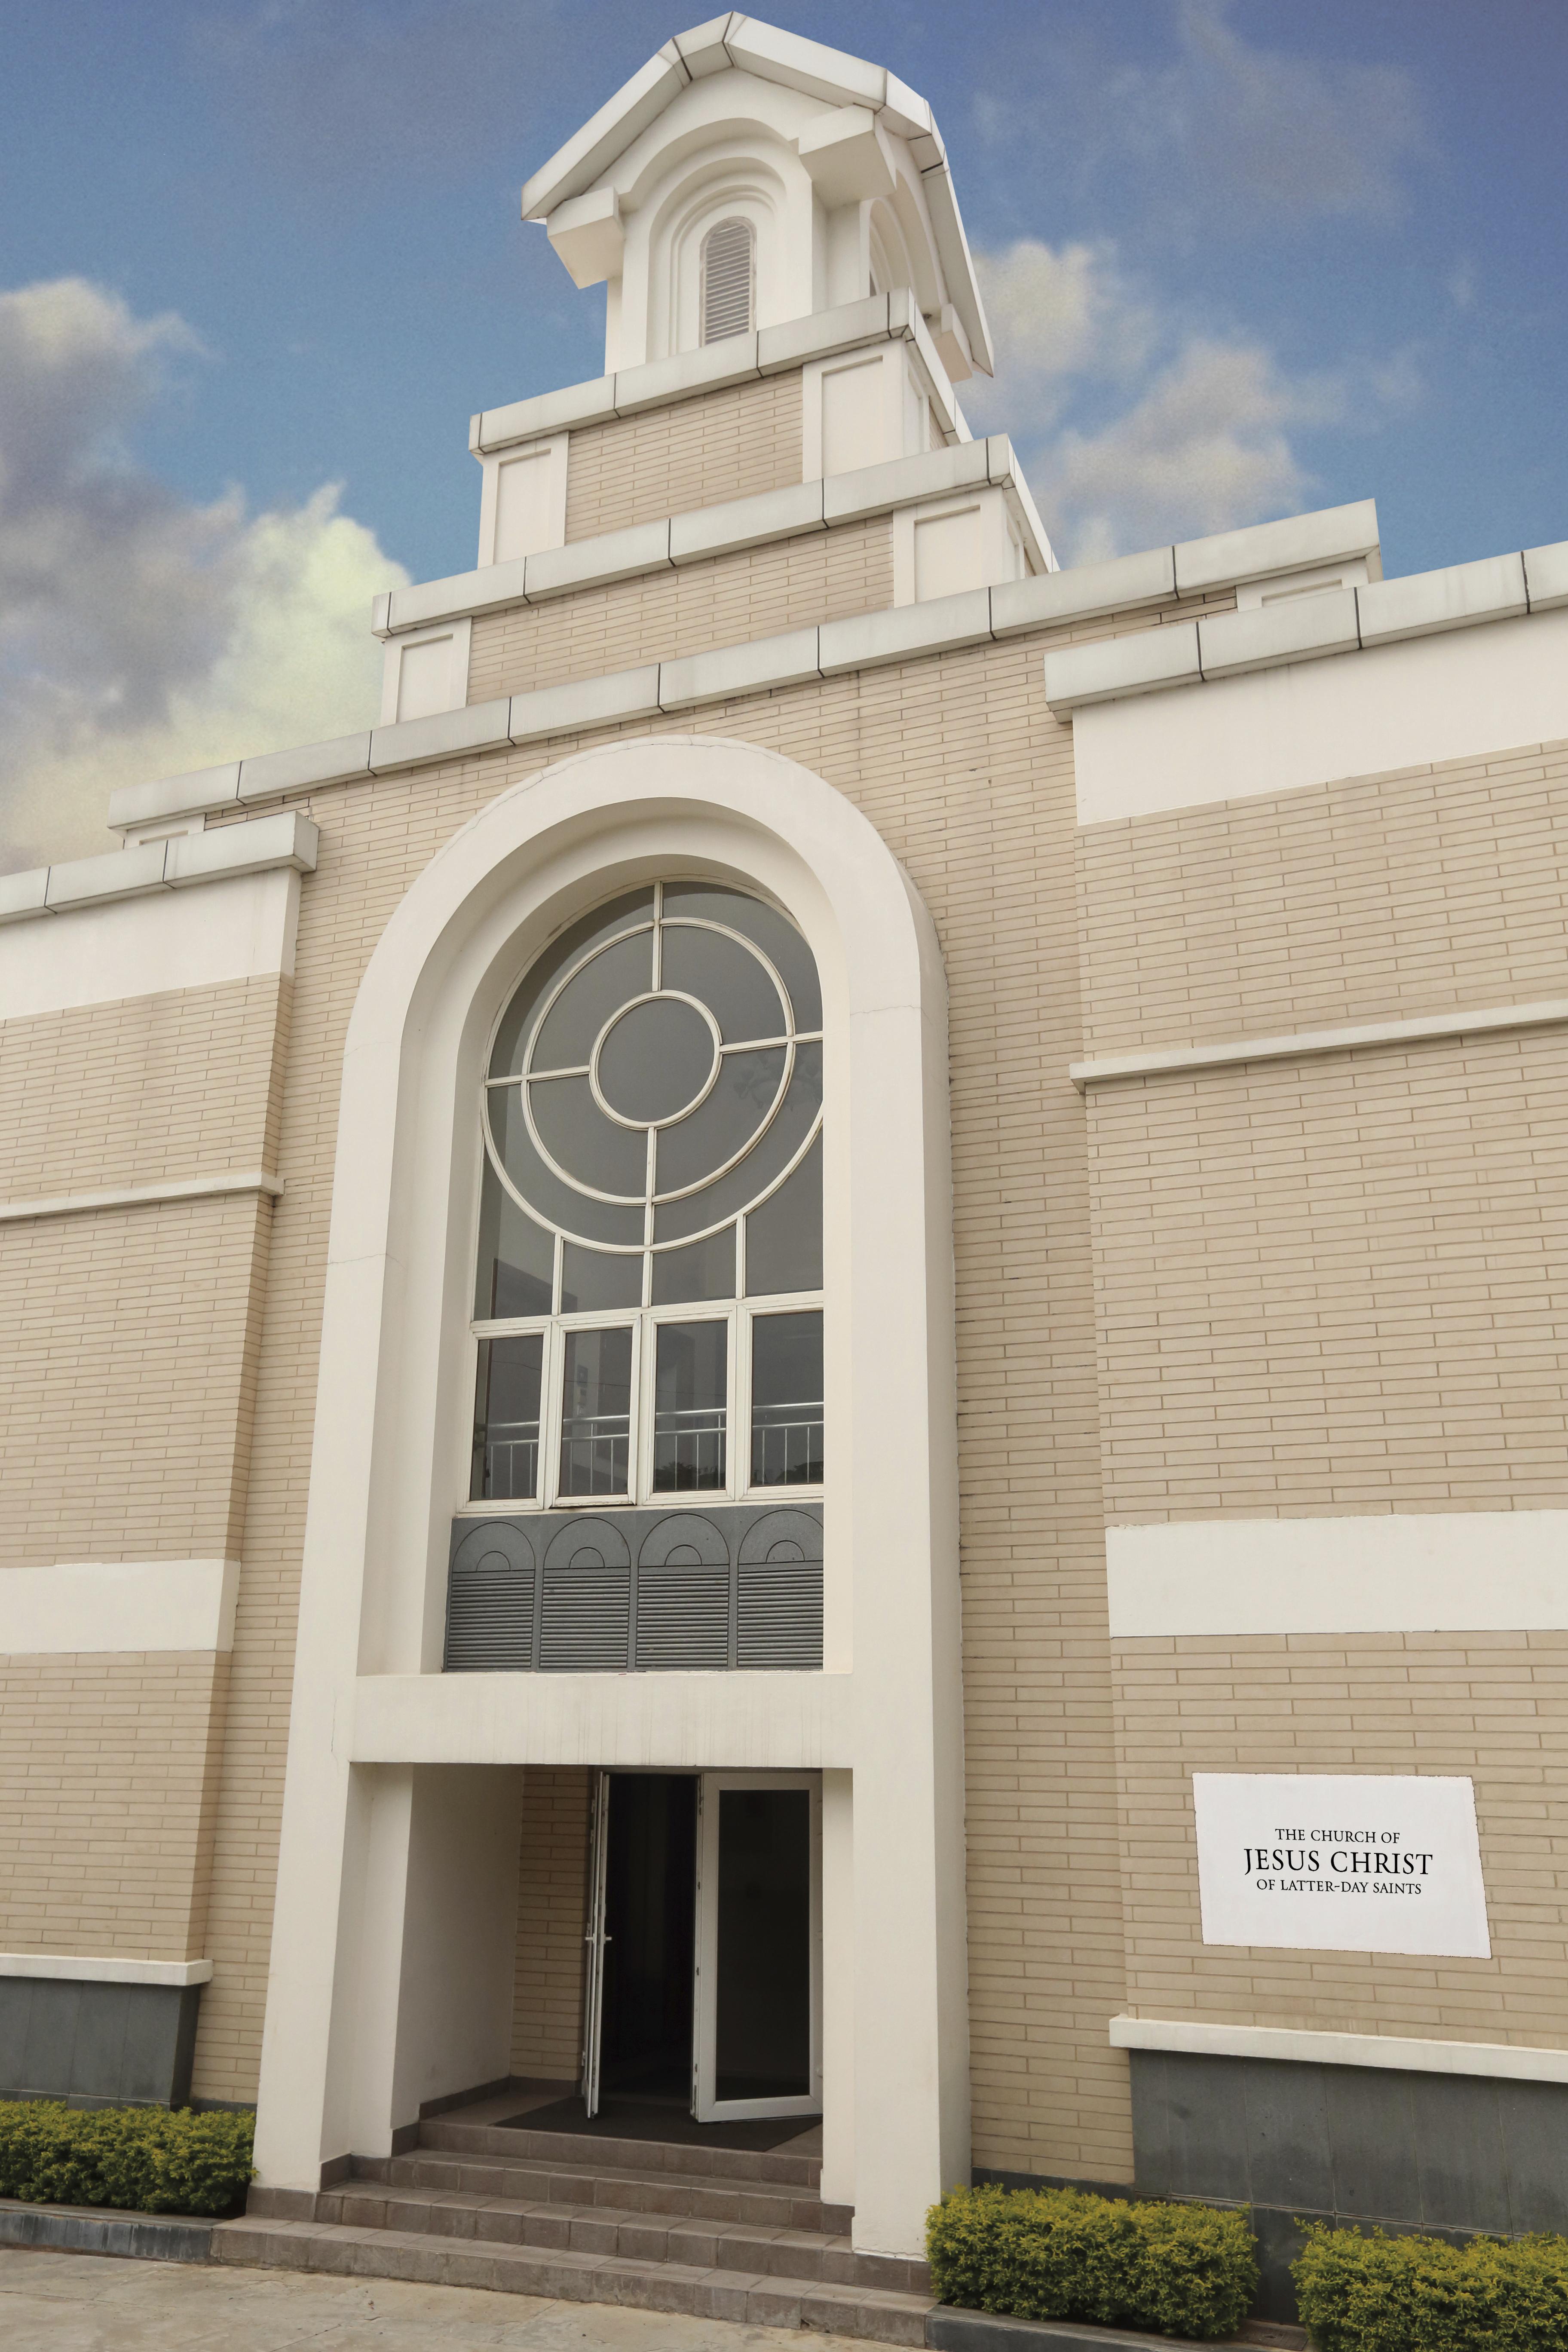 A front view outside a chapel entrance.